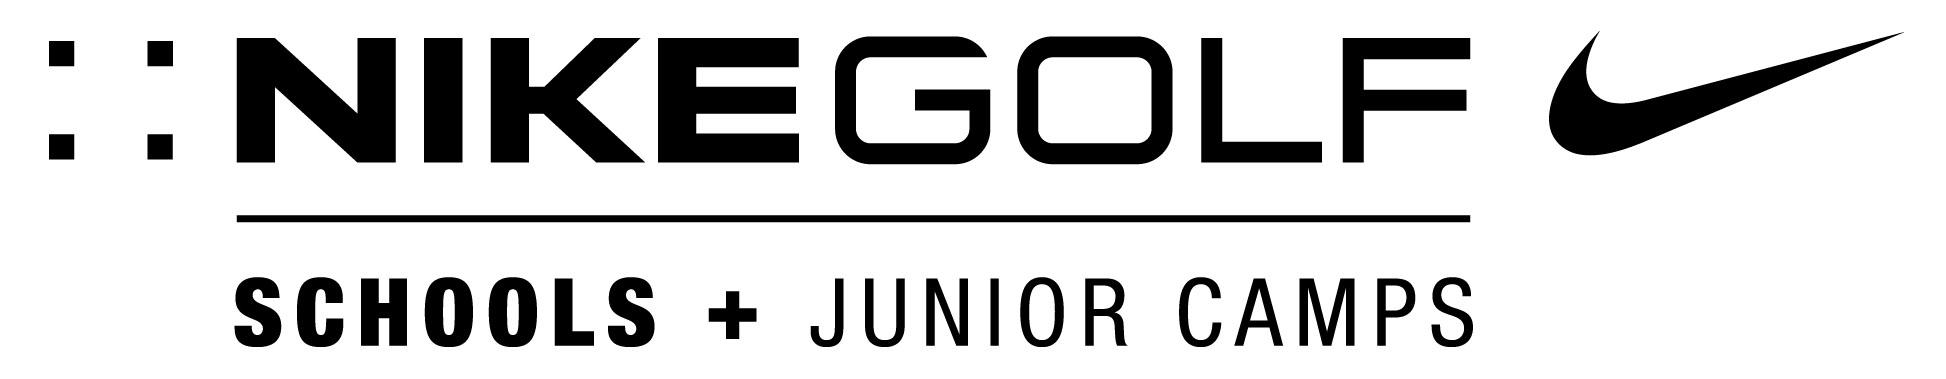 NIKE Junior Golf Camps, Broken Tee Golf Course